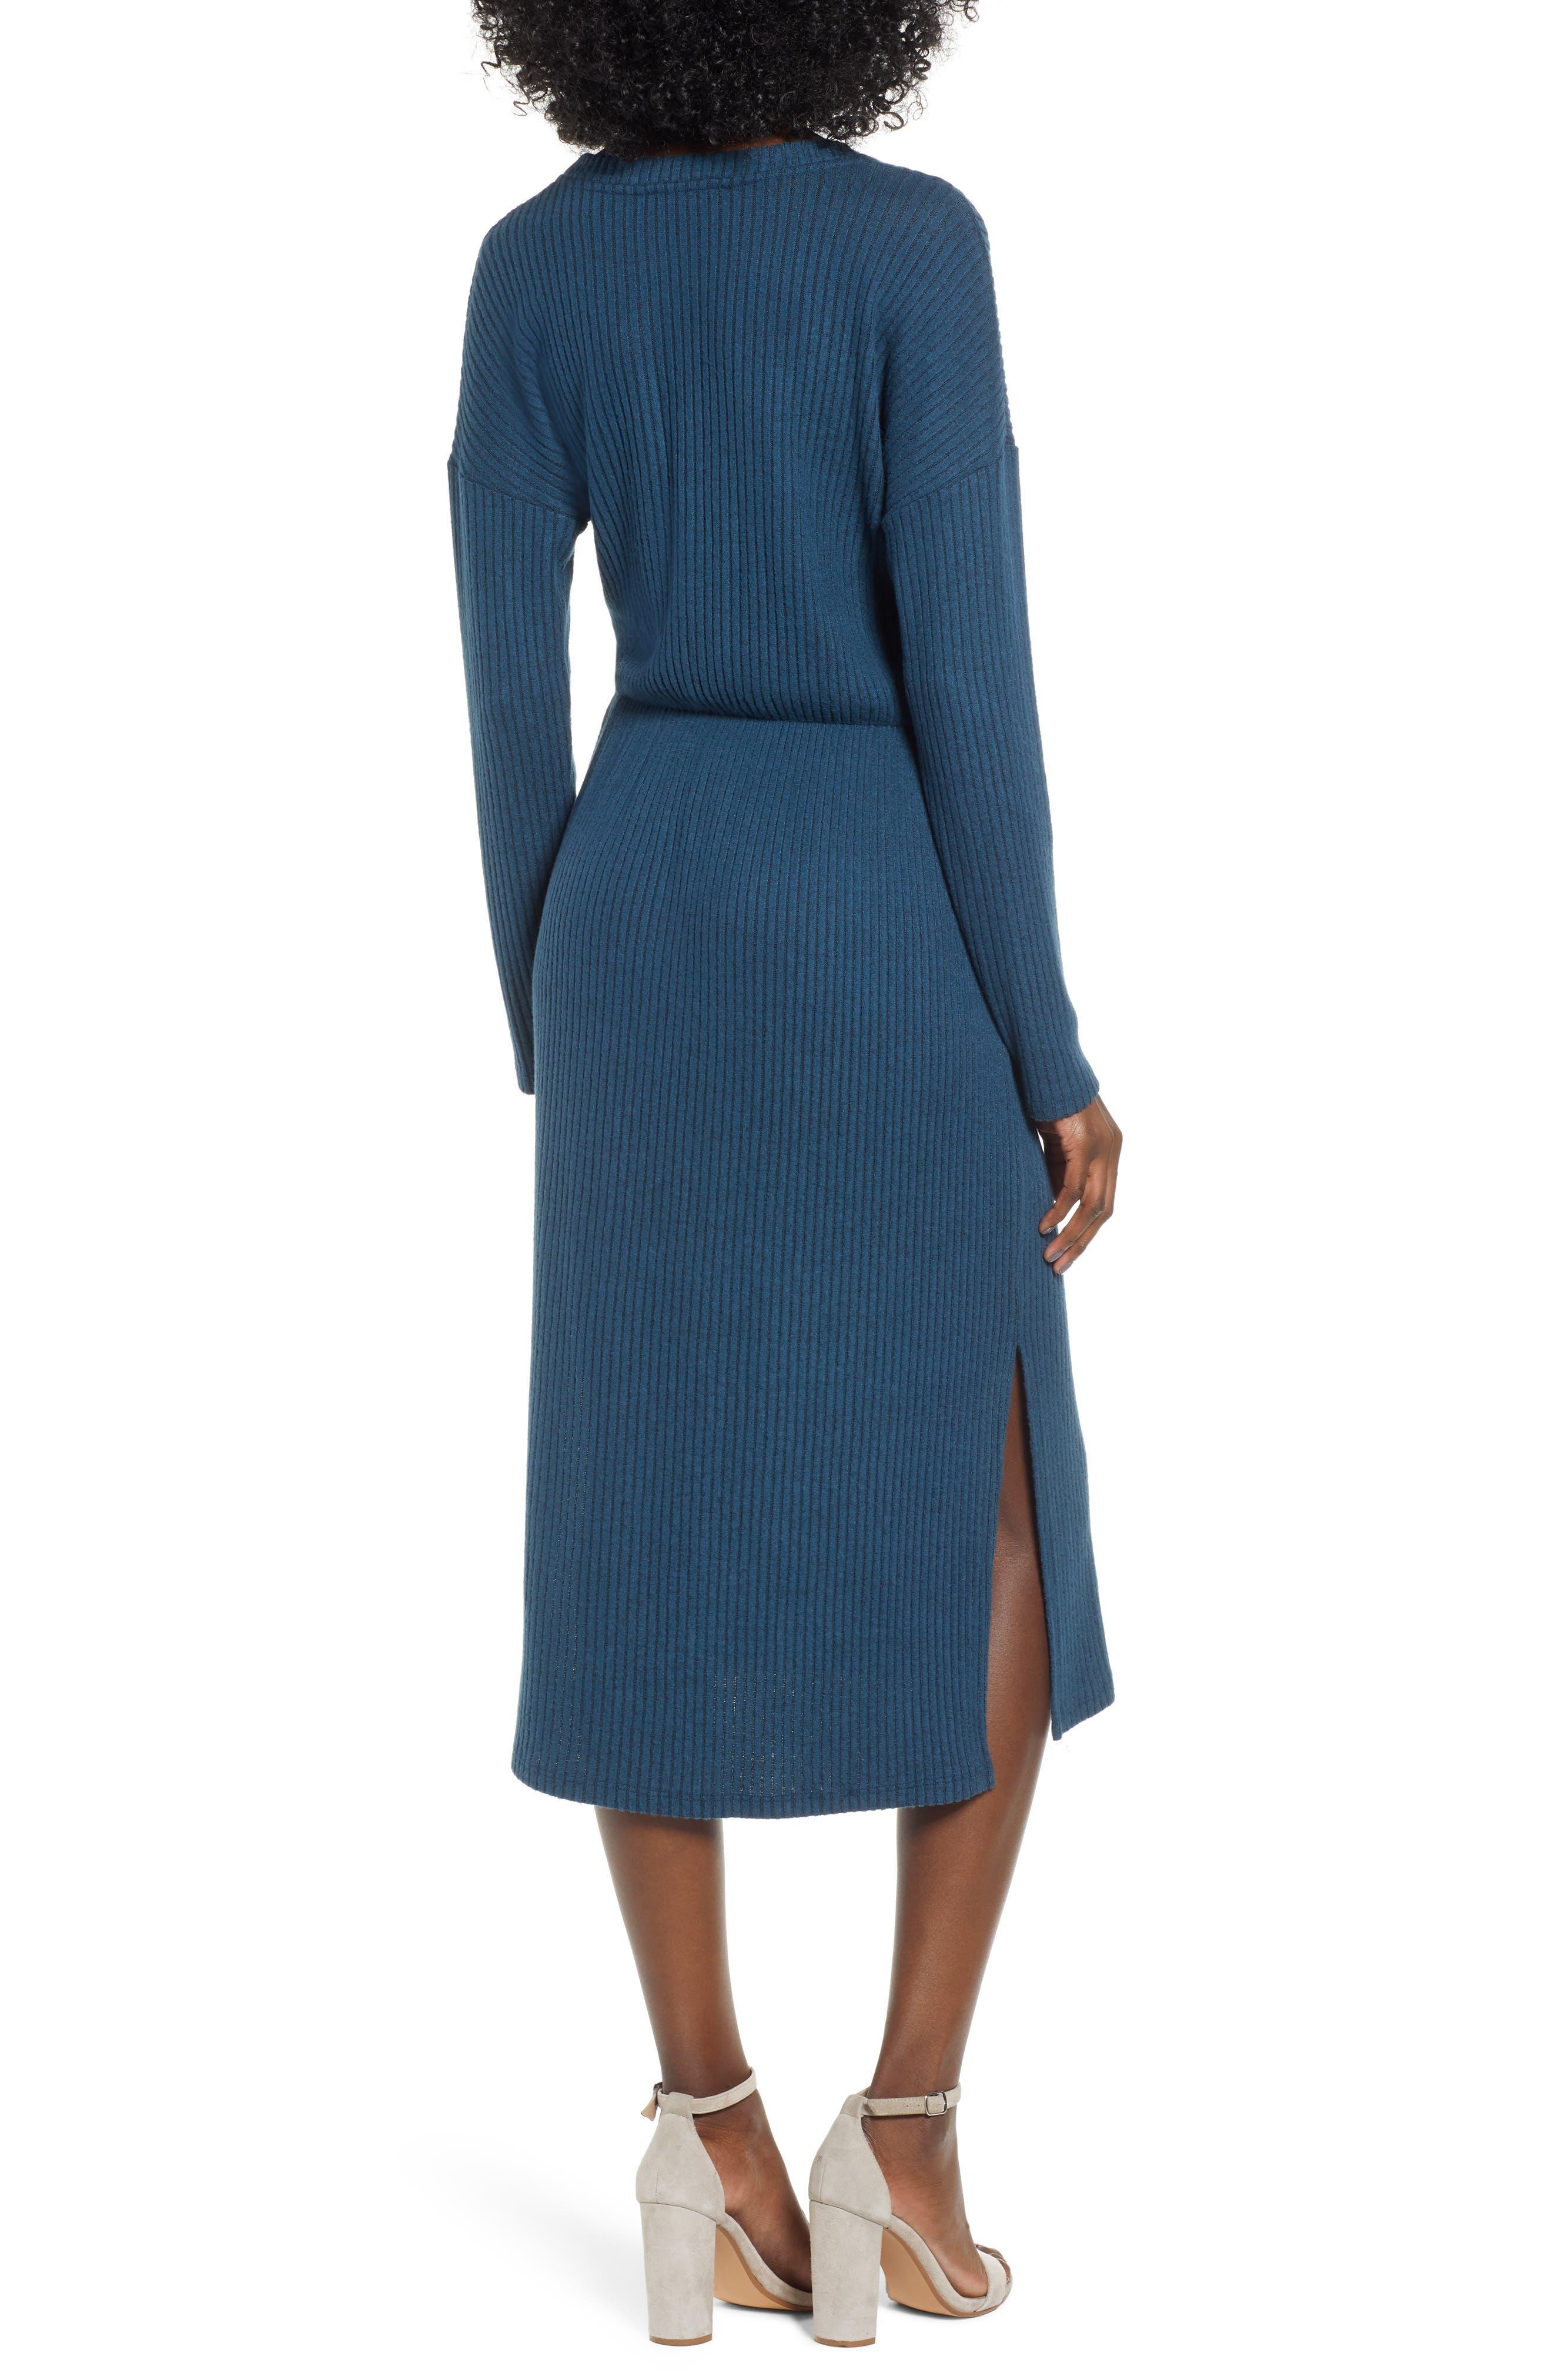 ALL IN FAVOR,                             Rib Knit Midi Dress,                             Alternate thumbnail 2, color,                             MIDNIGHT NAVY